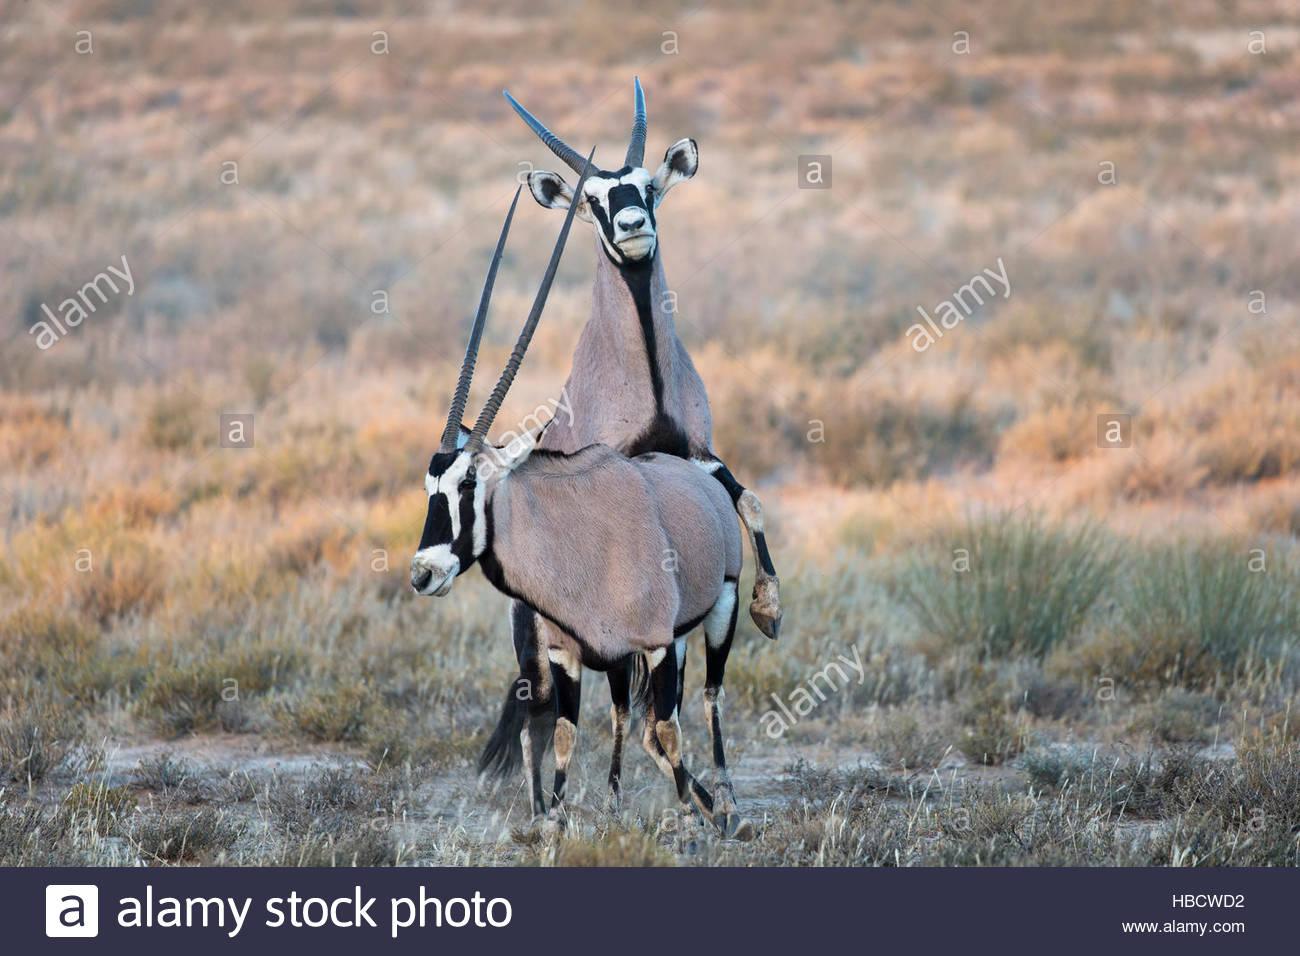 Gemsbok (Oryx gazella) mating, Kgalagadi transfrontier park, South Africa - Stock Image